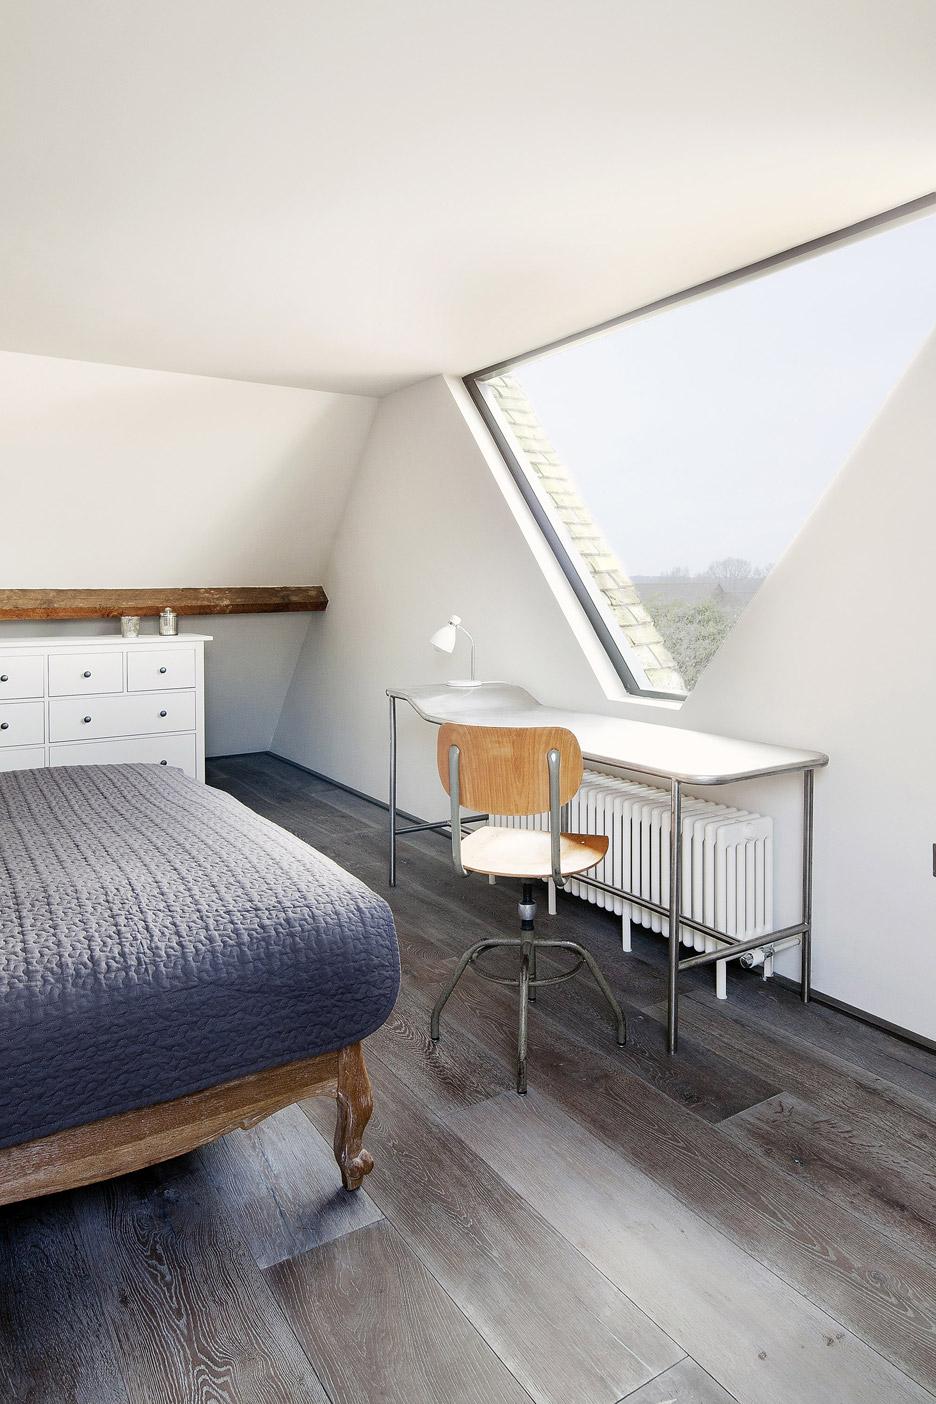 architecture_ambulance_house__design_studia_interiors_osnovadesign_osnova_poltava_17